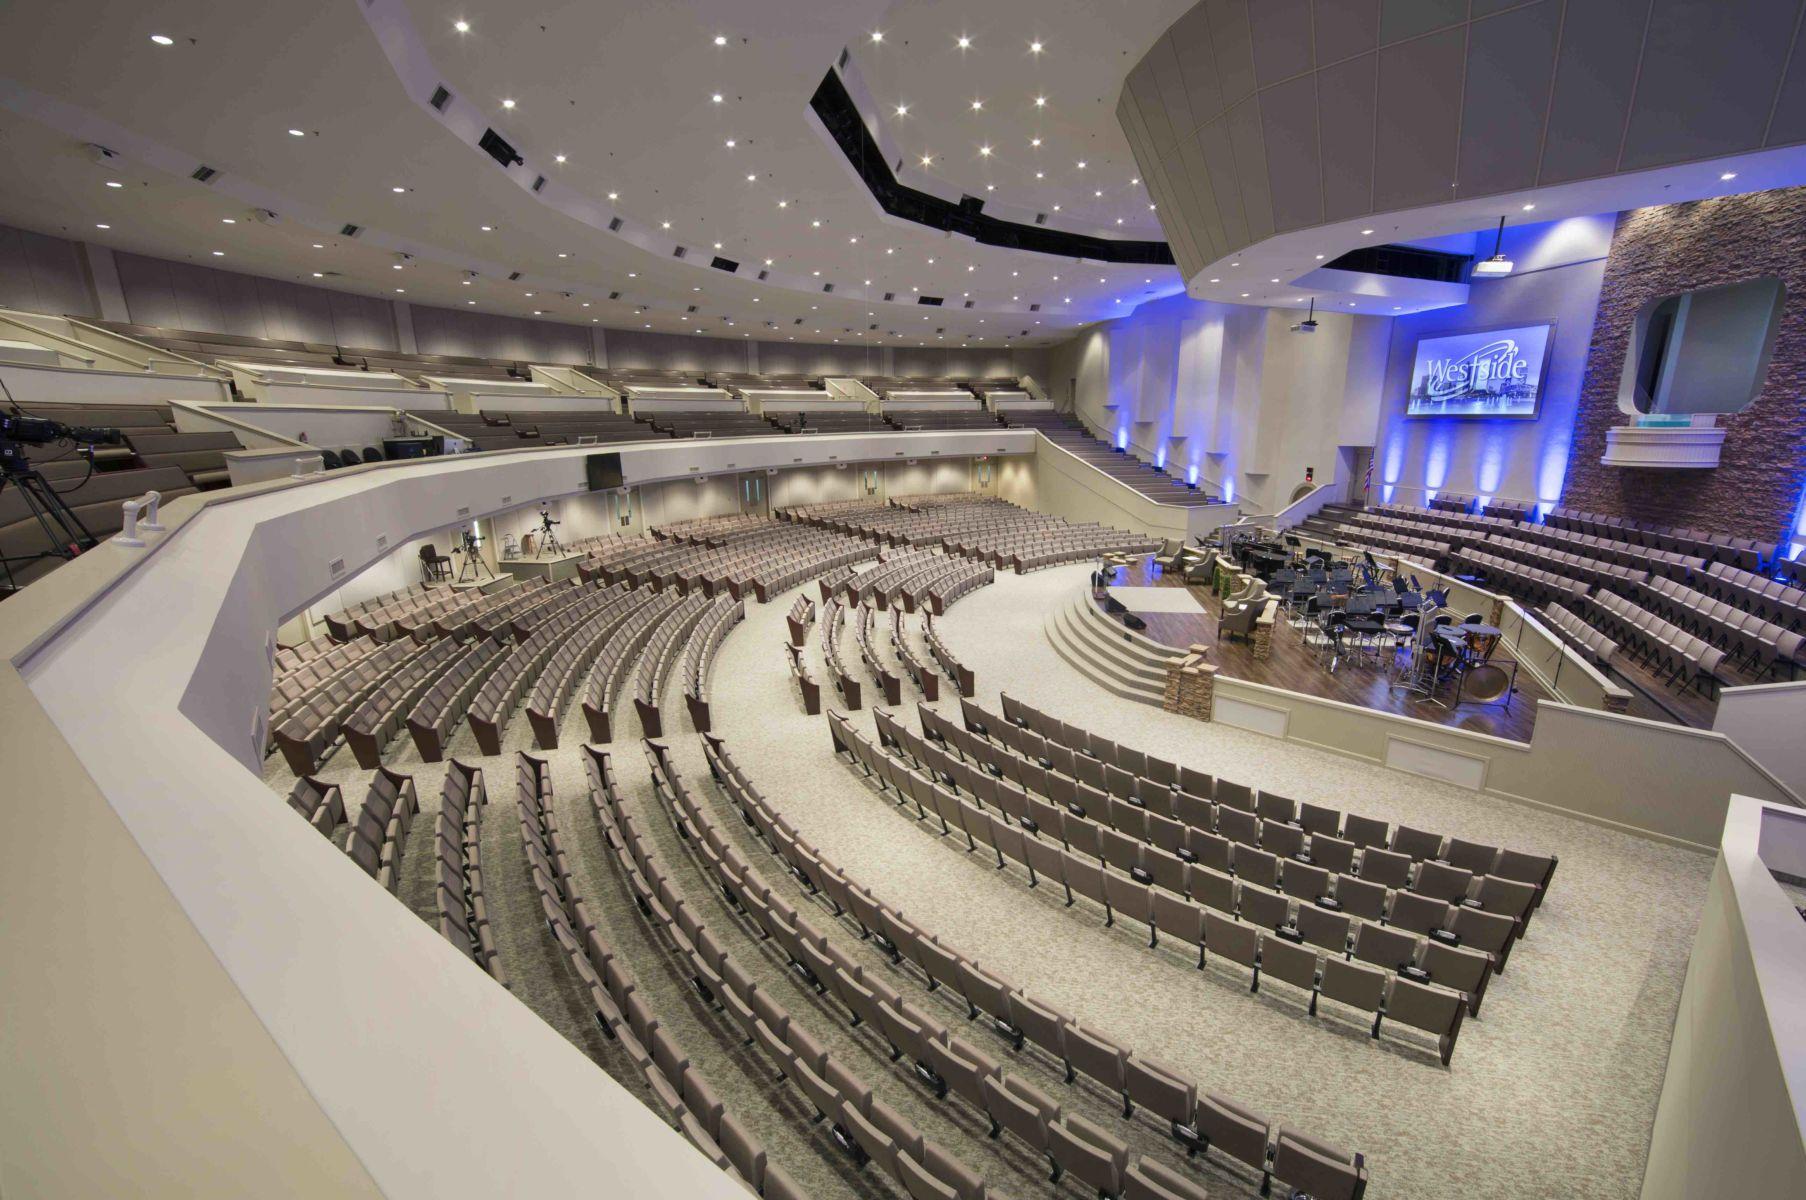 Church Furniture Furnishings Seating Lighting